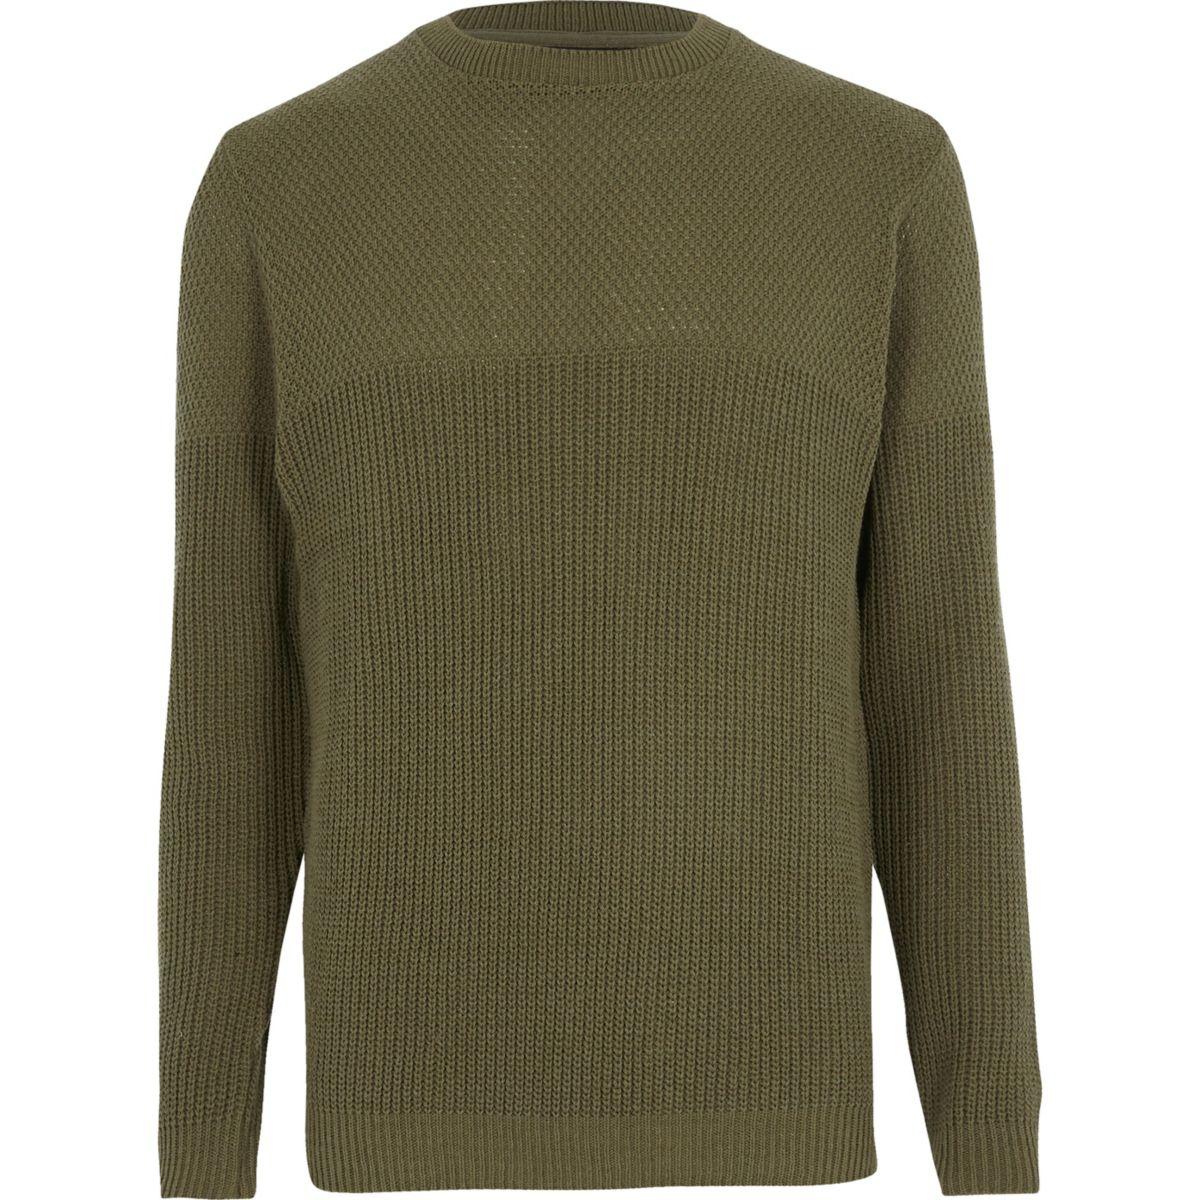 Dark green textured knit slim fit sweater